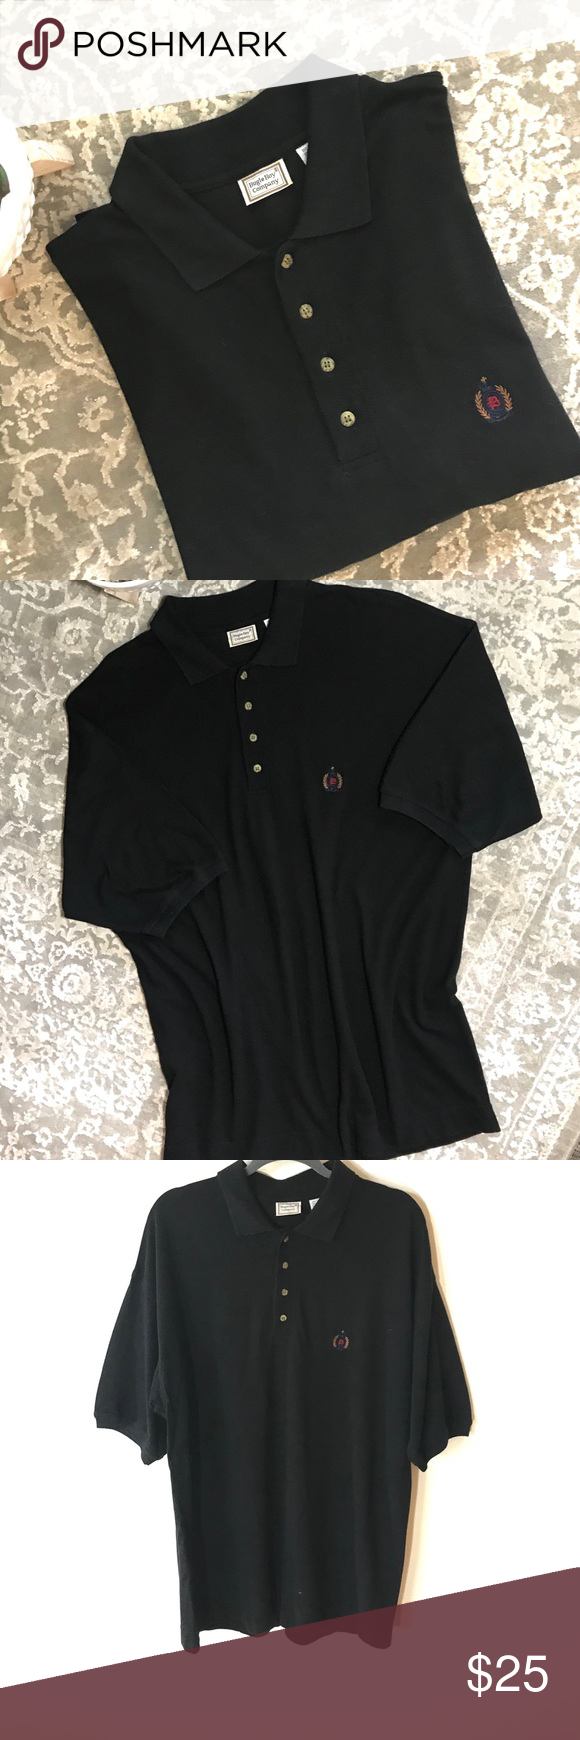 83c6d039f Men's VTG BUGLE BOY Polo Shirt - L Like New! Vintage BUGLE BOY Black Short